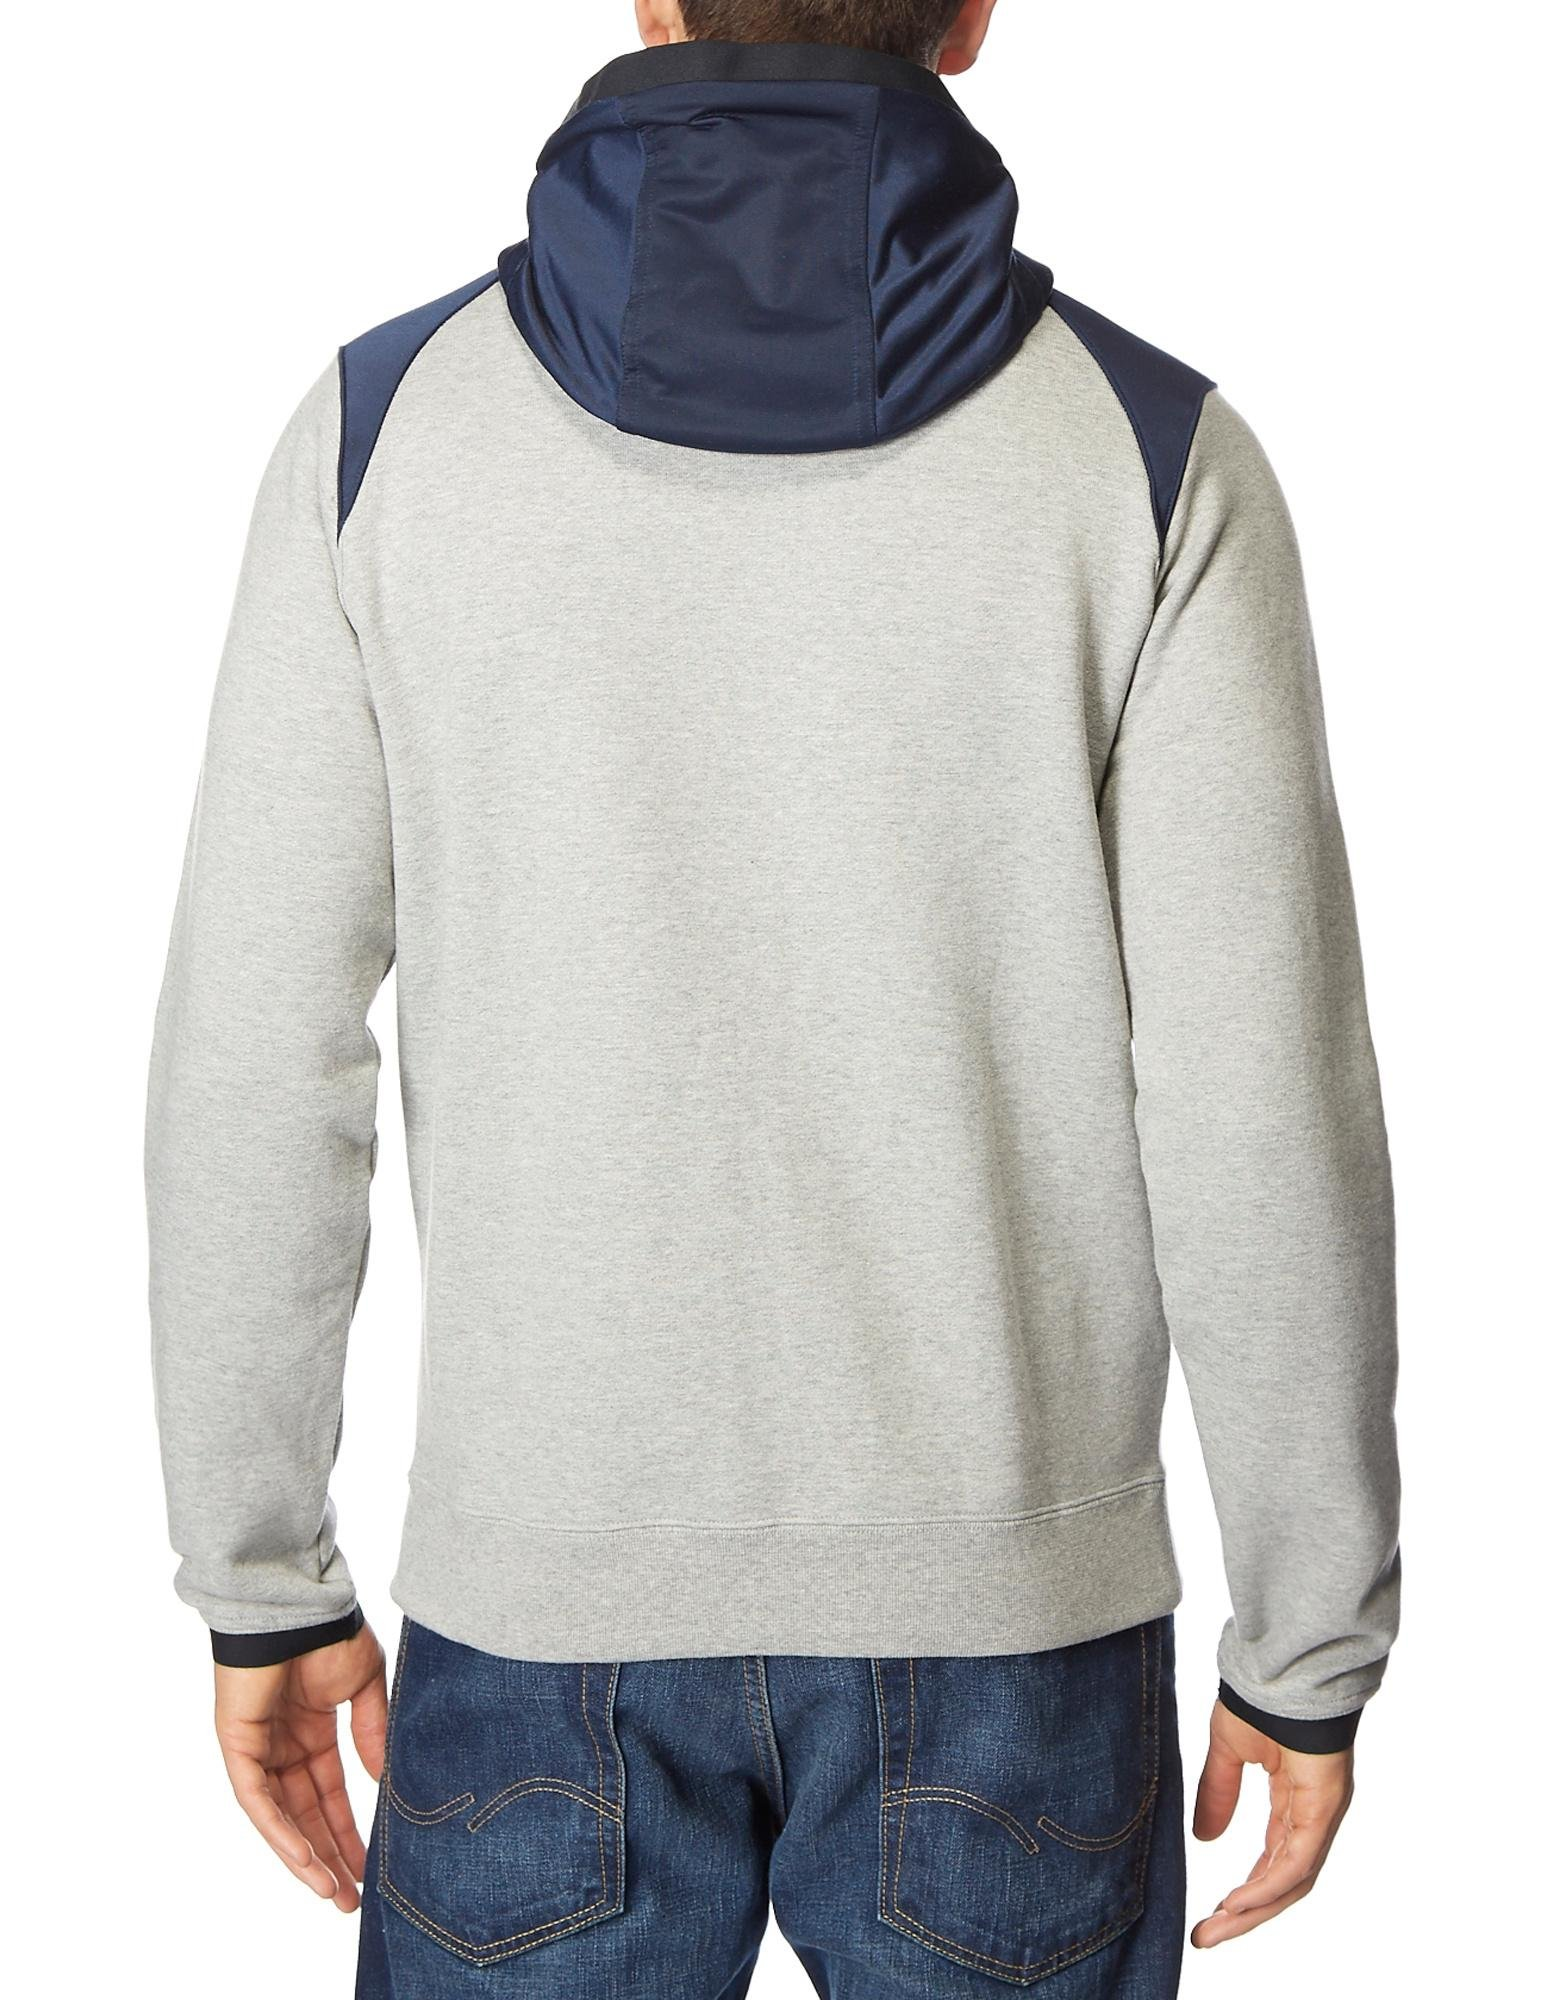 Chaqueta de forro polar con capucha Nike Hybrid